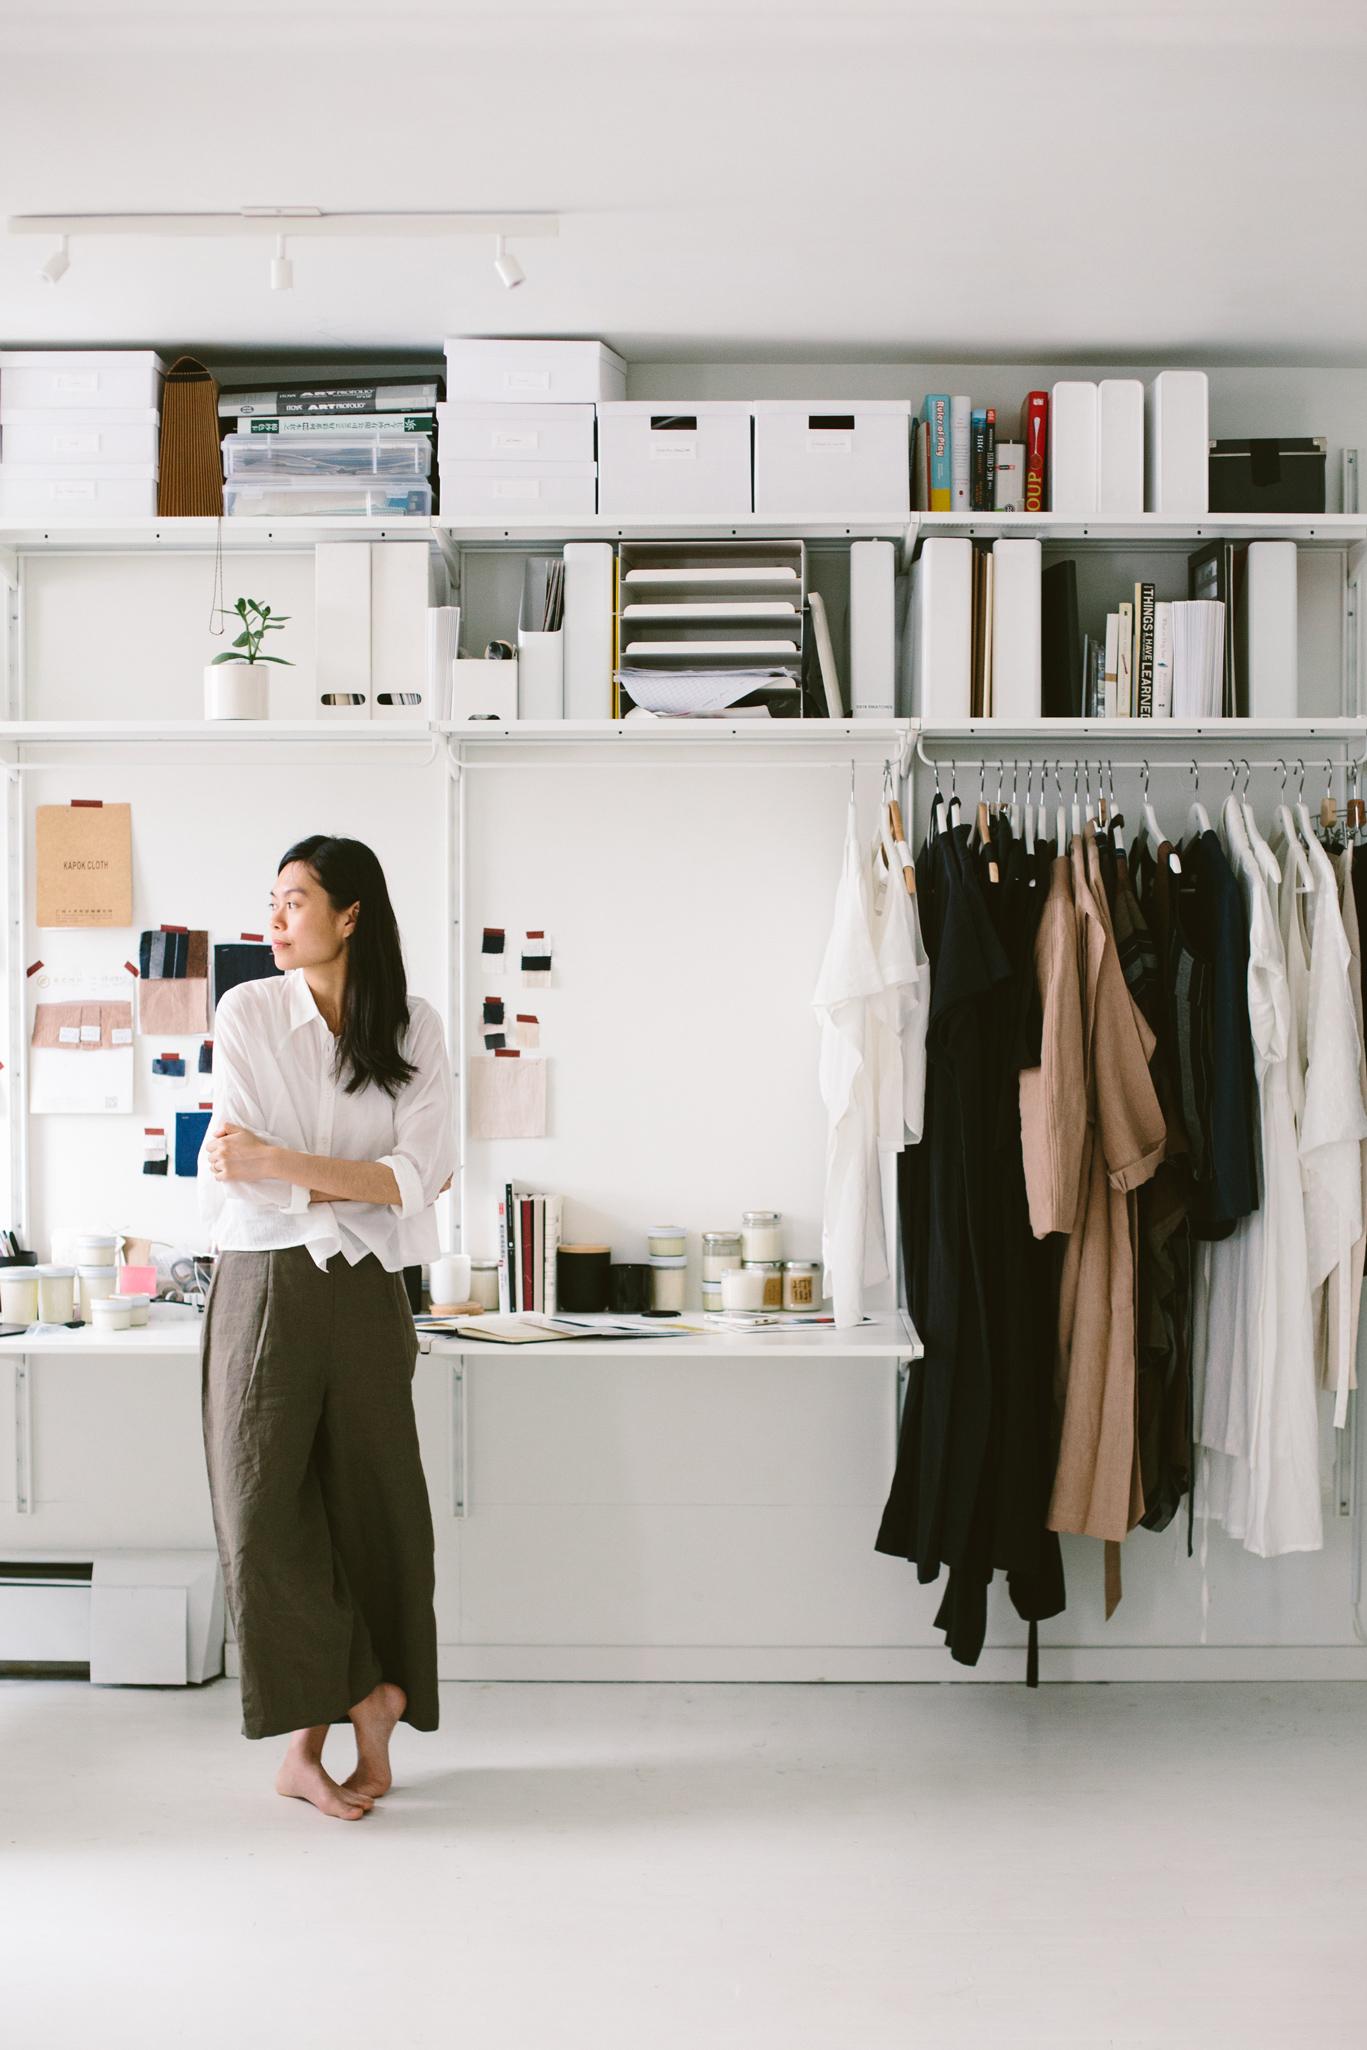 Szeki Chan in her New York studio